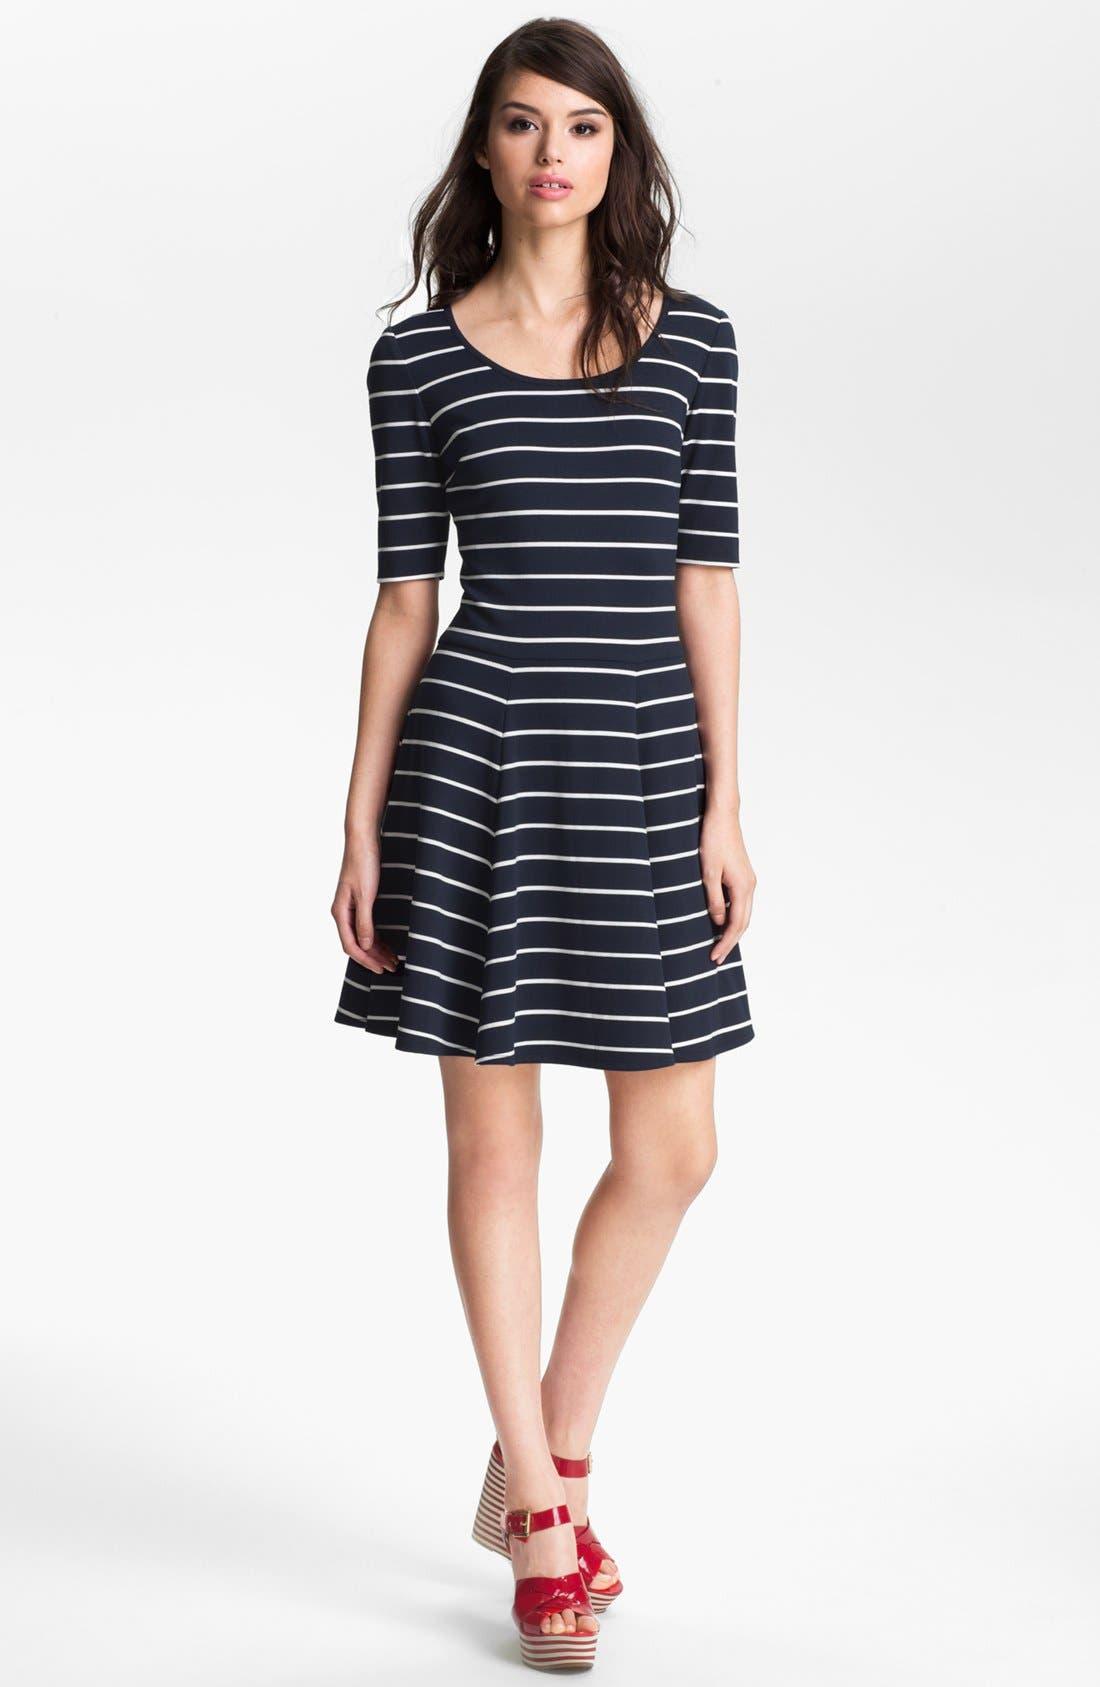 Alternate Image 1 Selected - Eliza J Stripe Fit & Flare Dress (Petite)